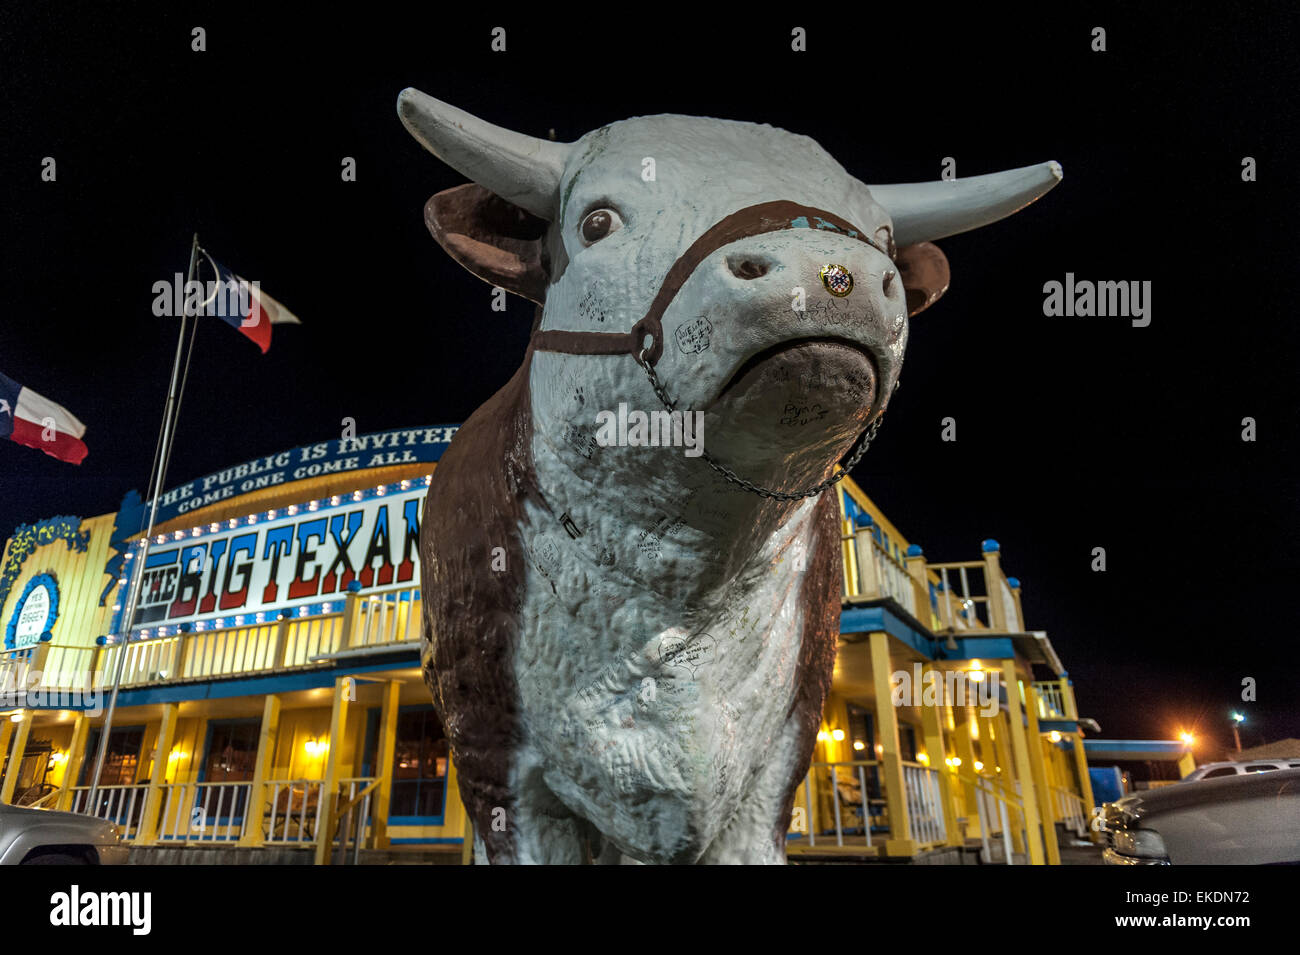 Big Texan Steak Ranch. Amarillo. Texas. USA - Stock Image